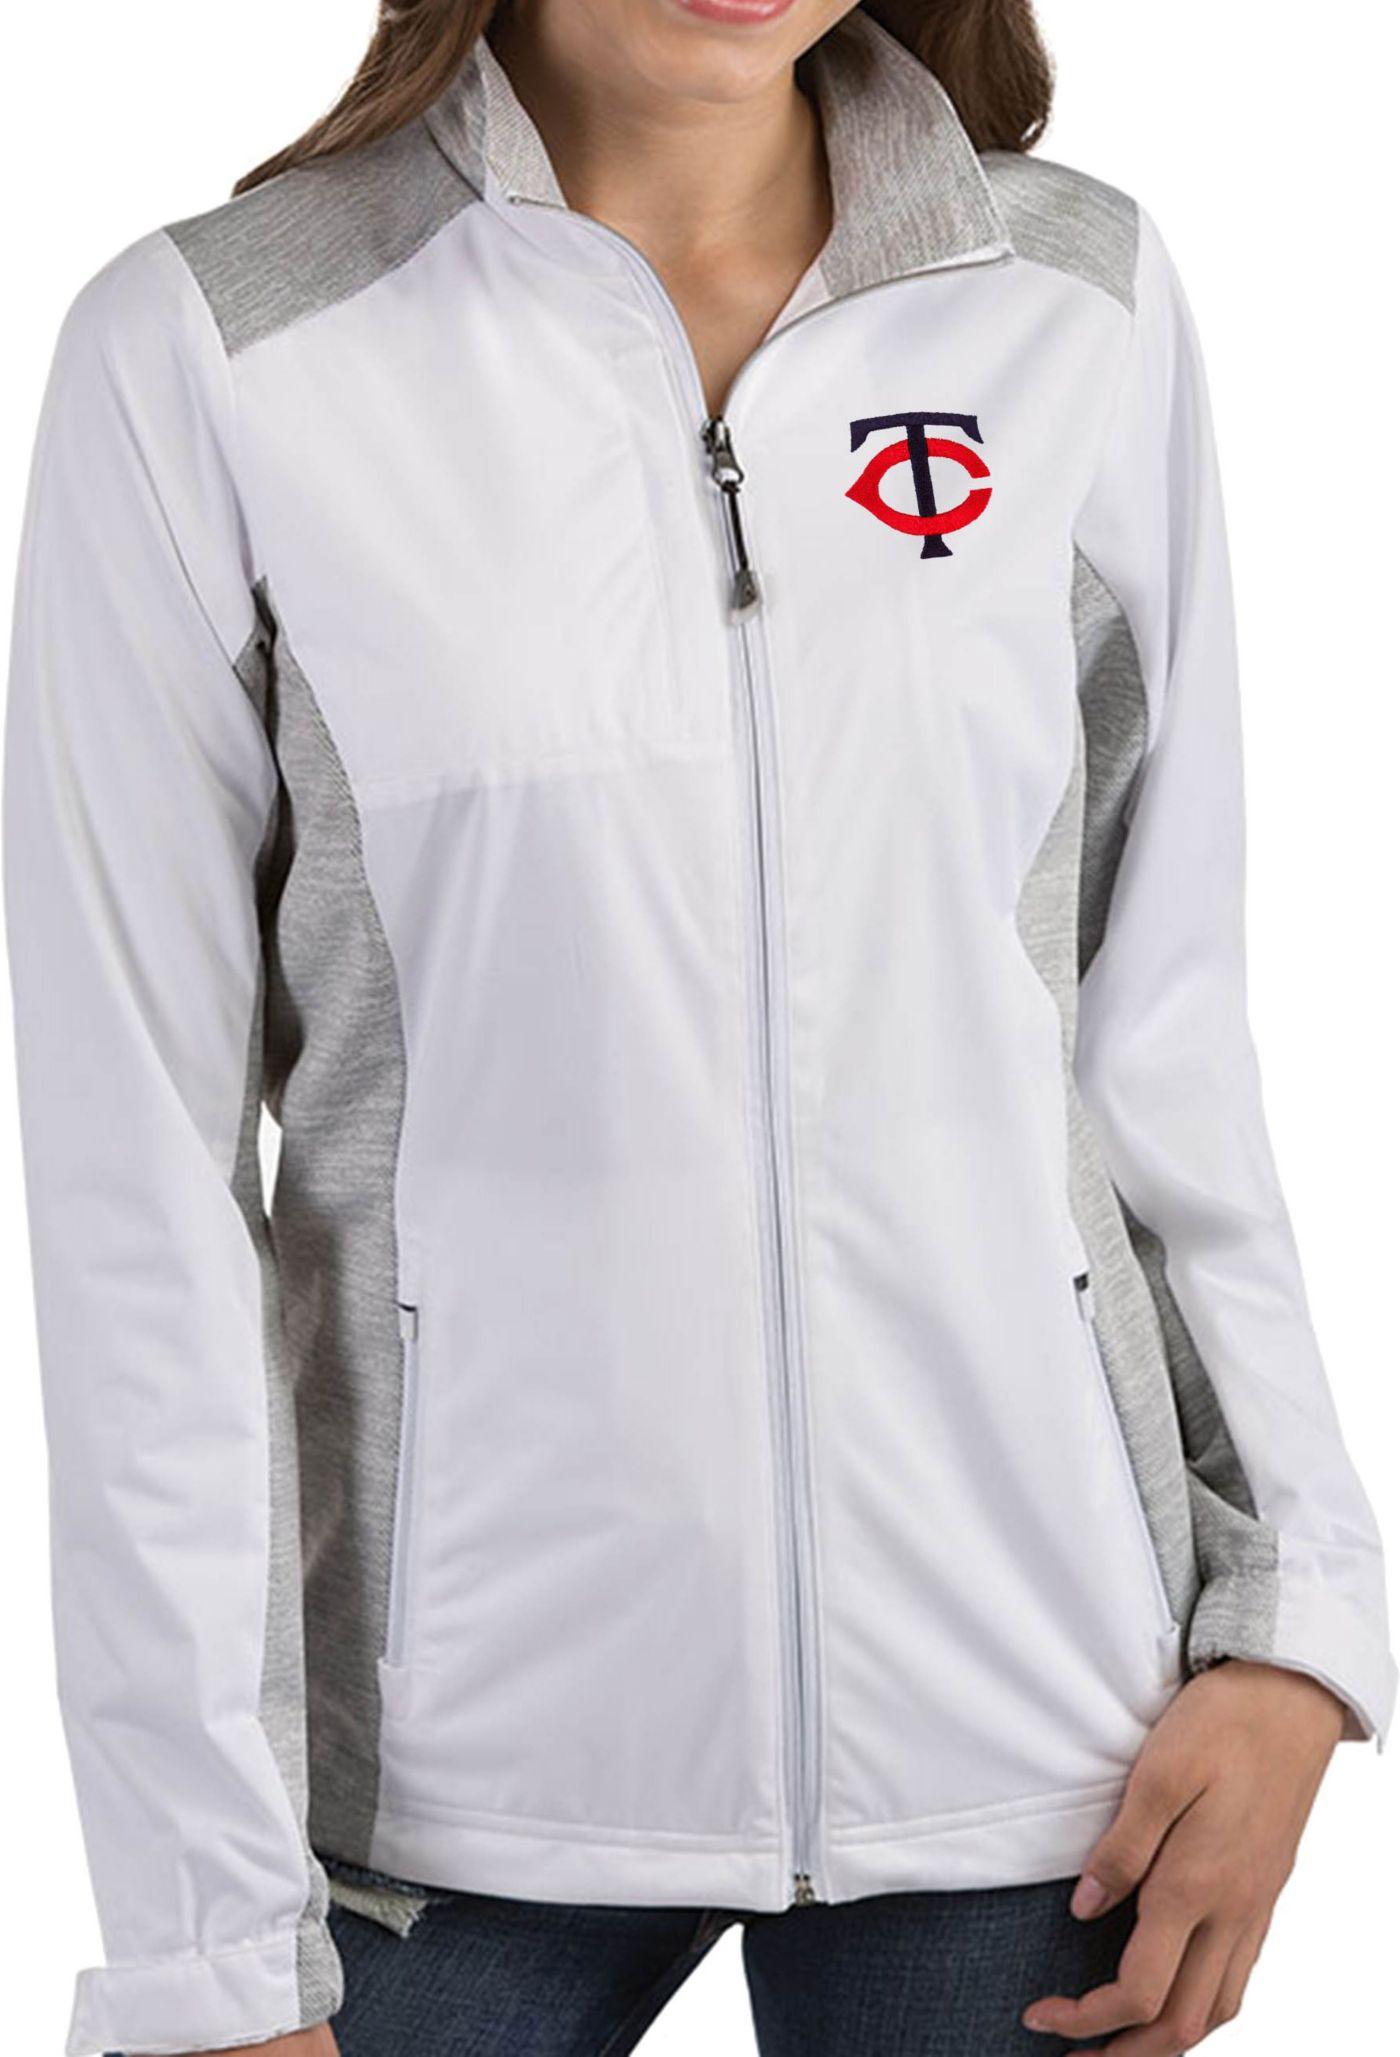 Antigua Women's Minnesota Twins Revolve White Full-Zip Jacket